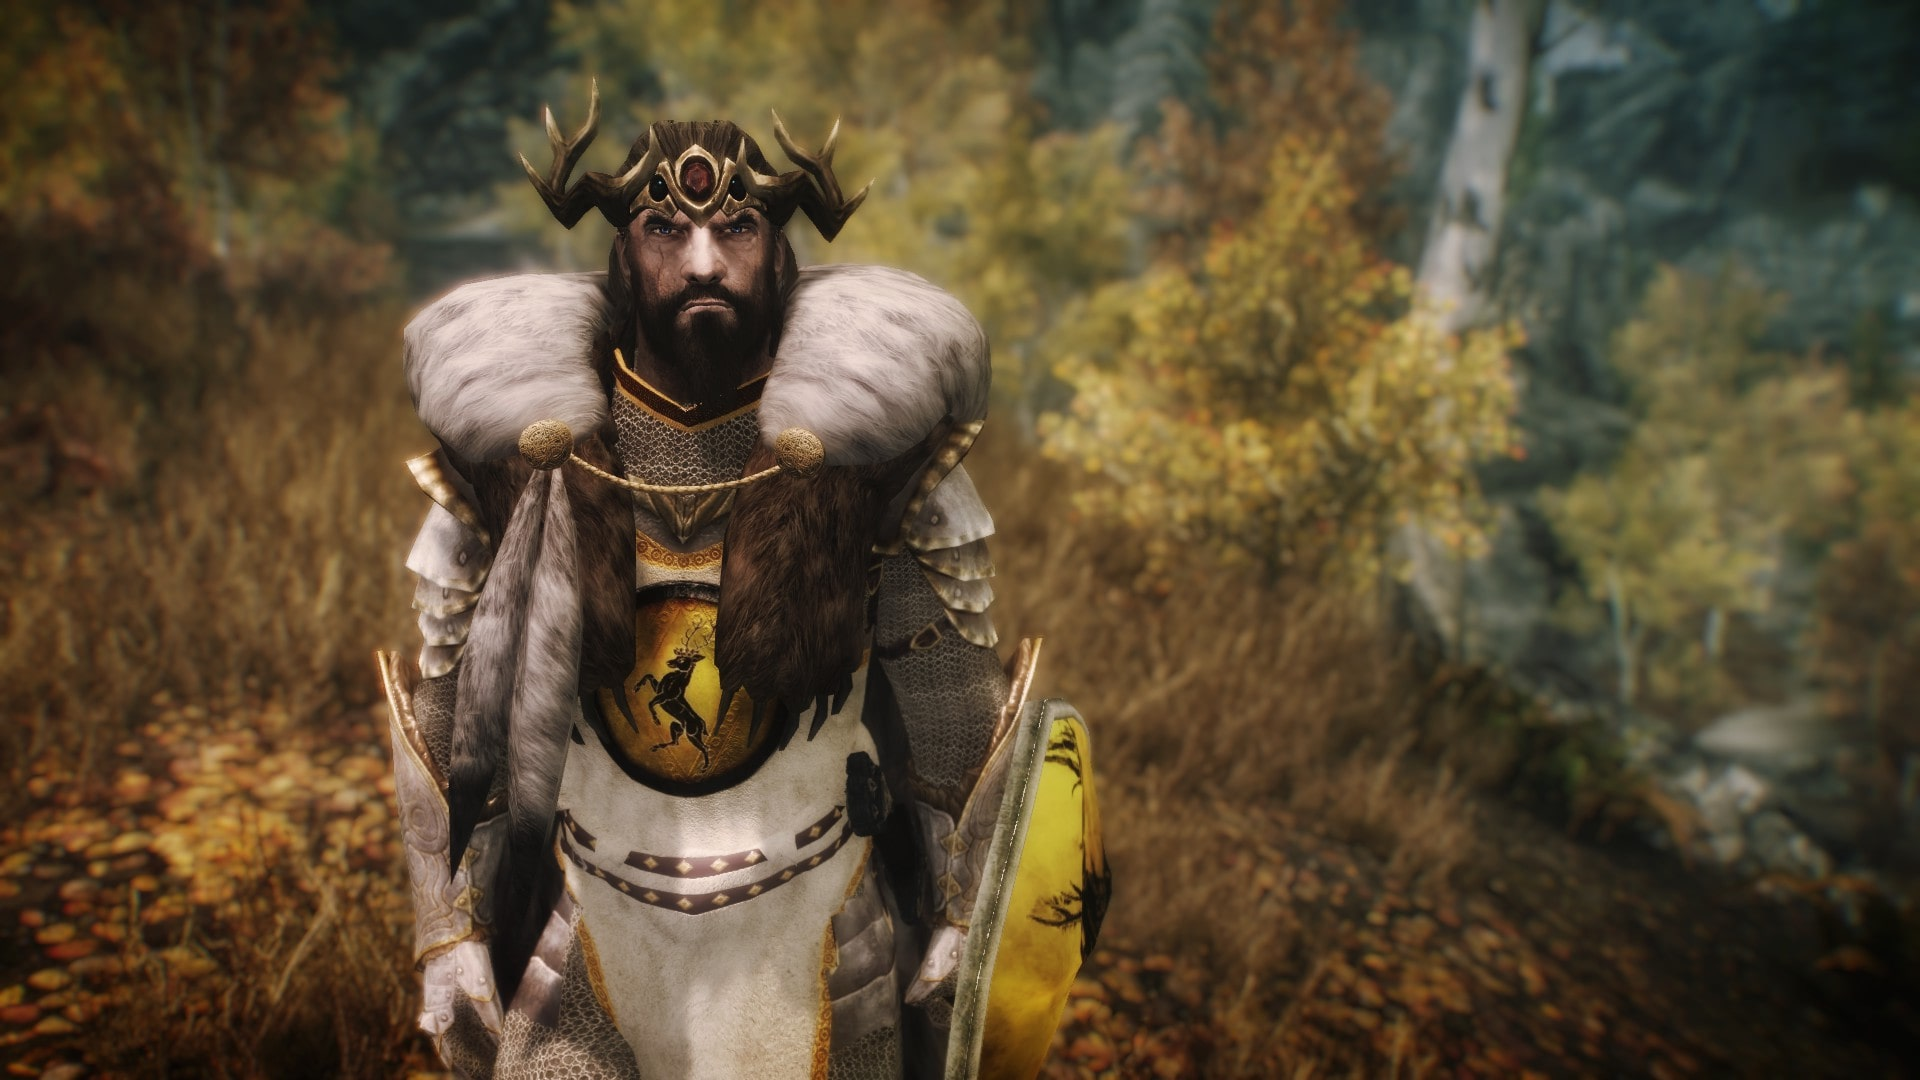 броня арьи старк игра престолов скайрим